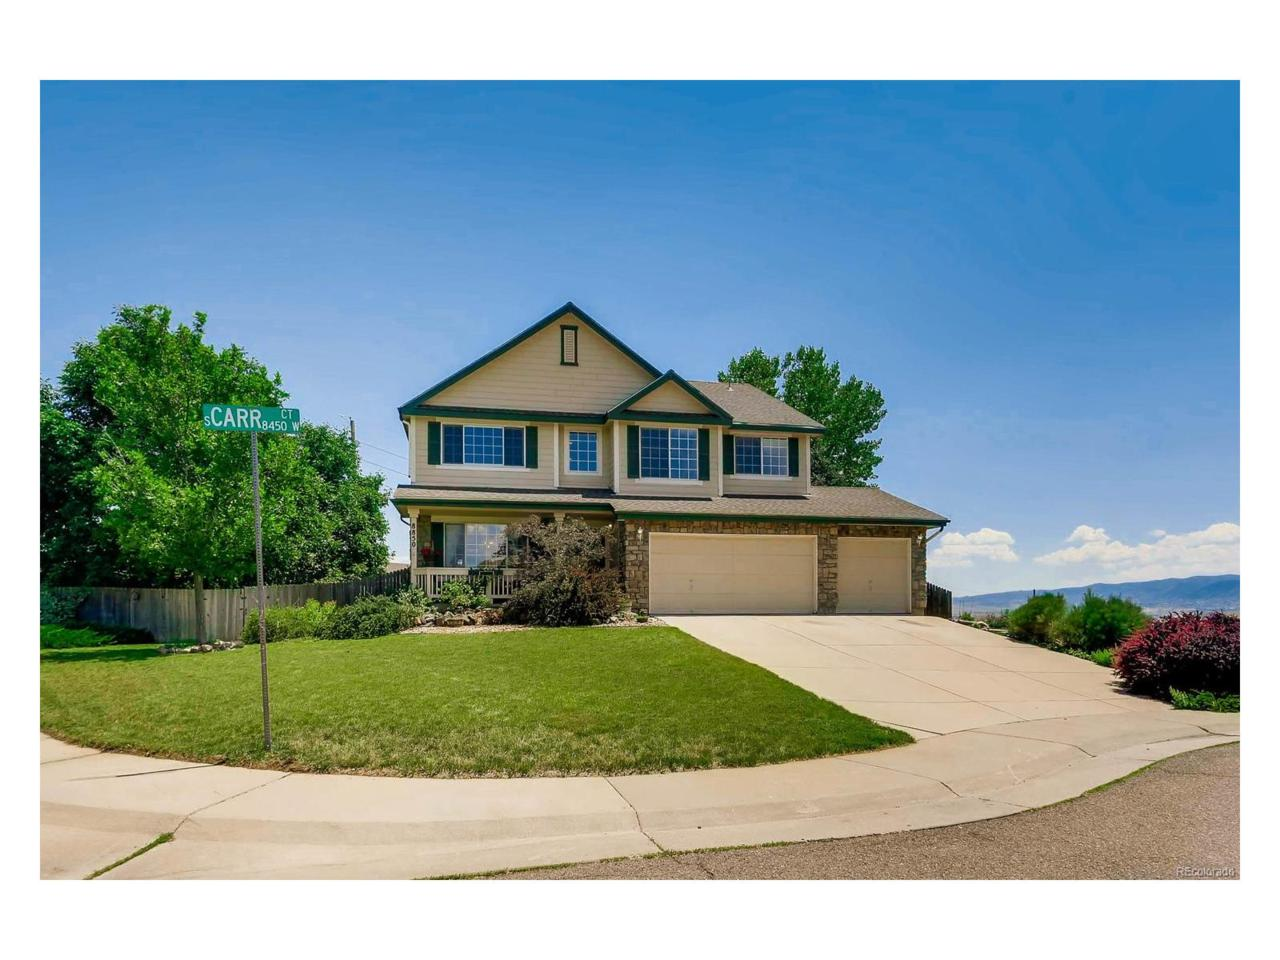 8850 S Carr Court, Littleton, CO 80128 (MLS #4627847) :: 8z Real Estate